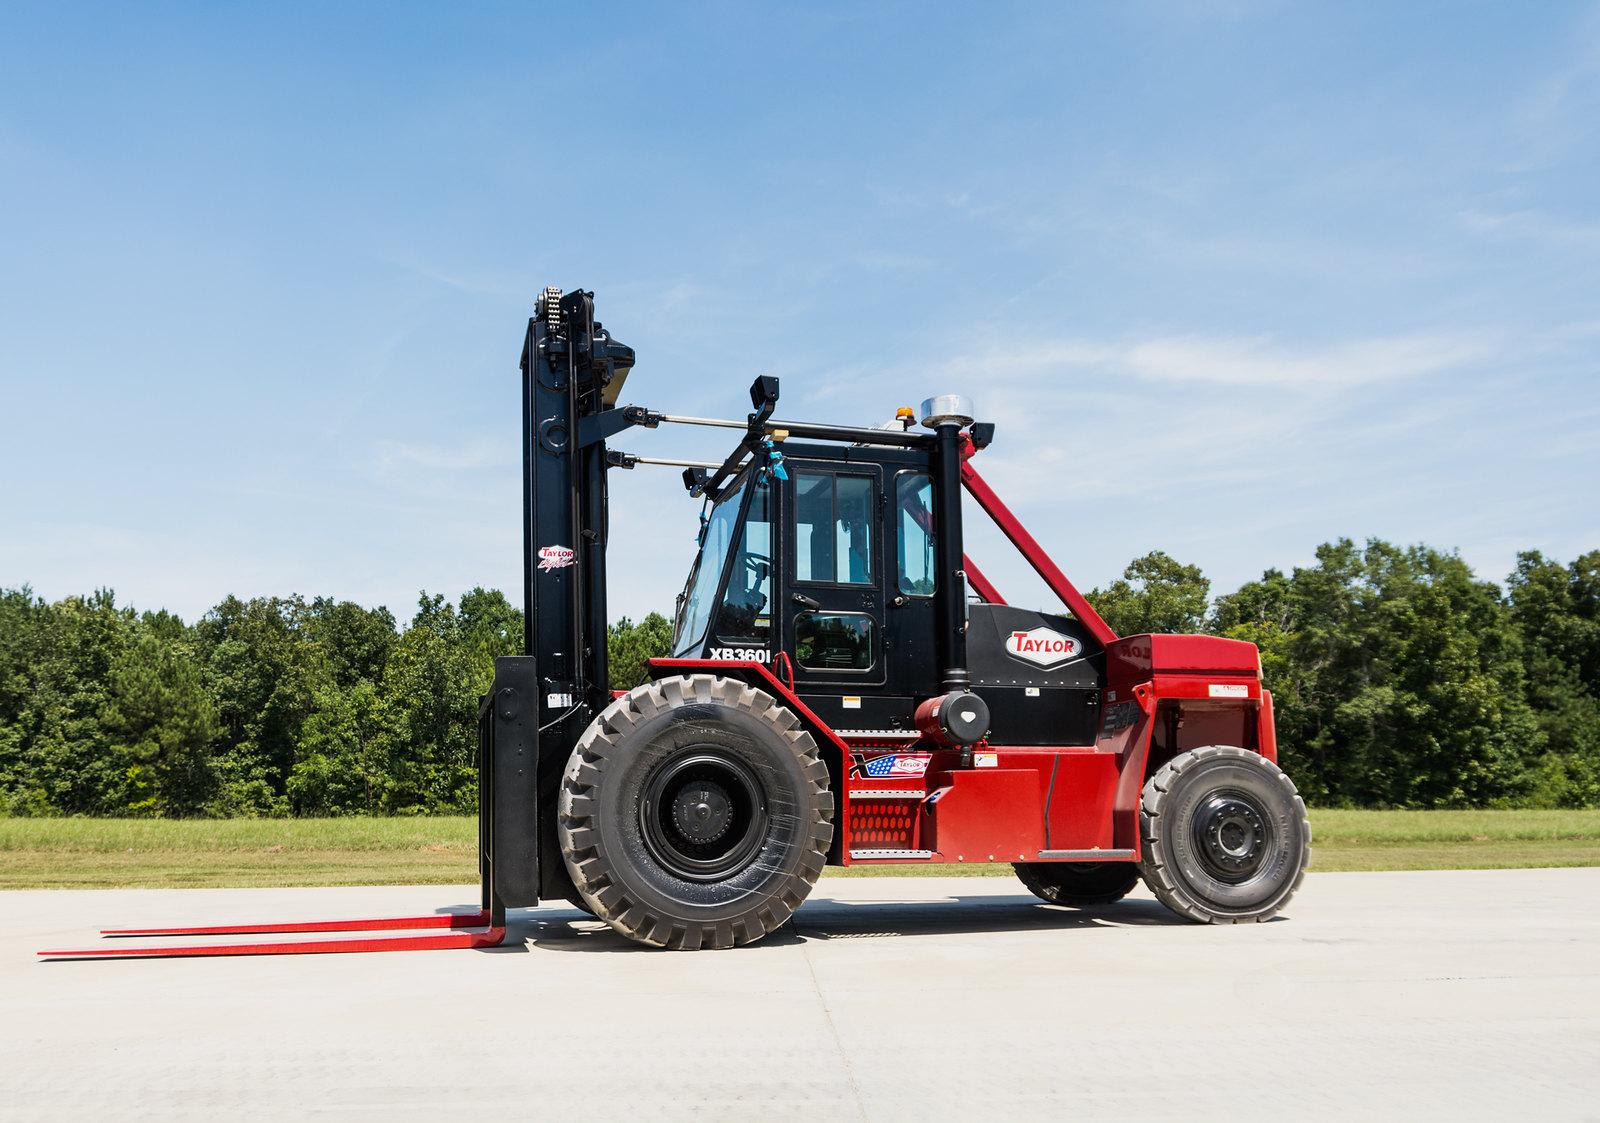 Big Wheel Taylor Products Forklift Hydraulic Control Valve Diagram Mast Bigwheel Xb 360l 36000lb Capacity